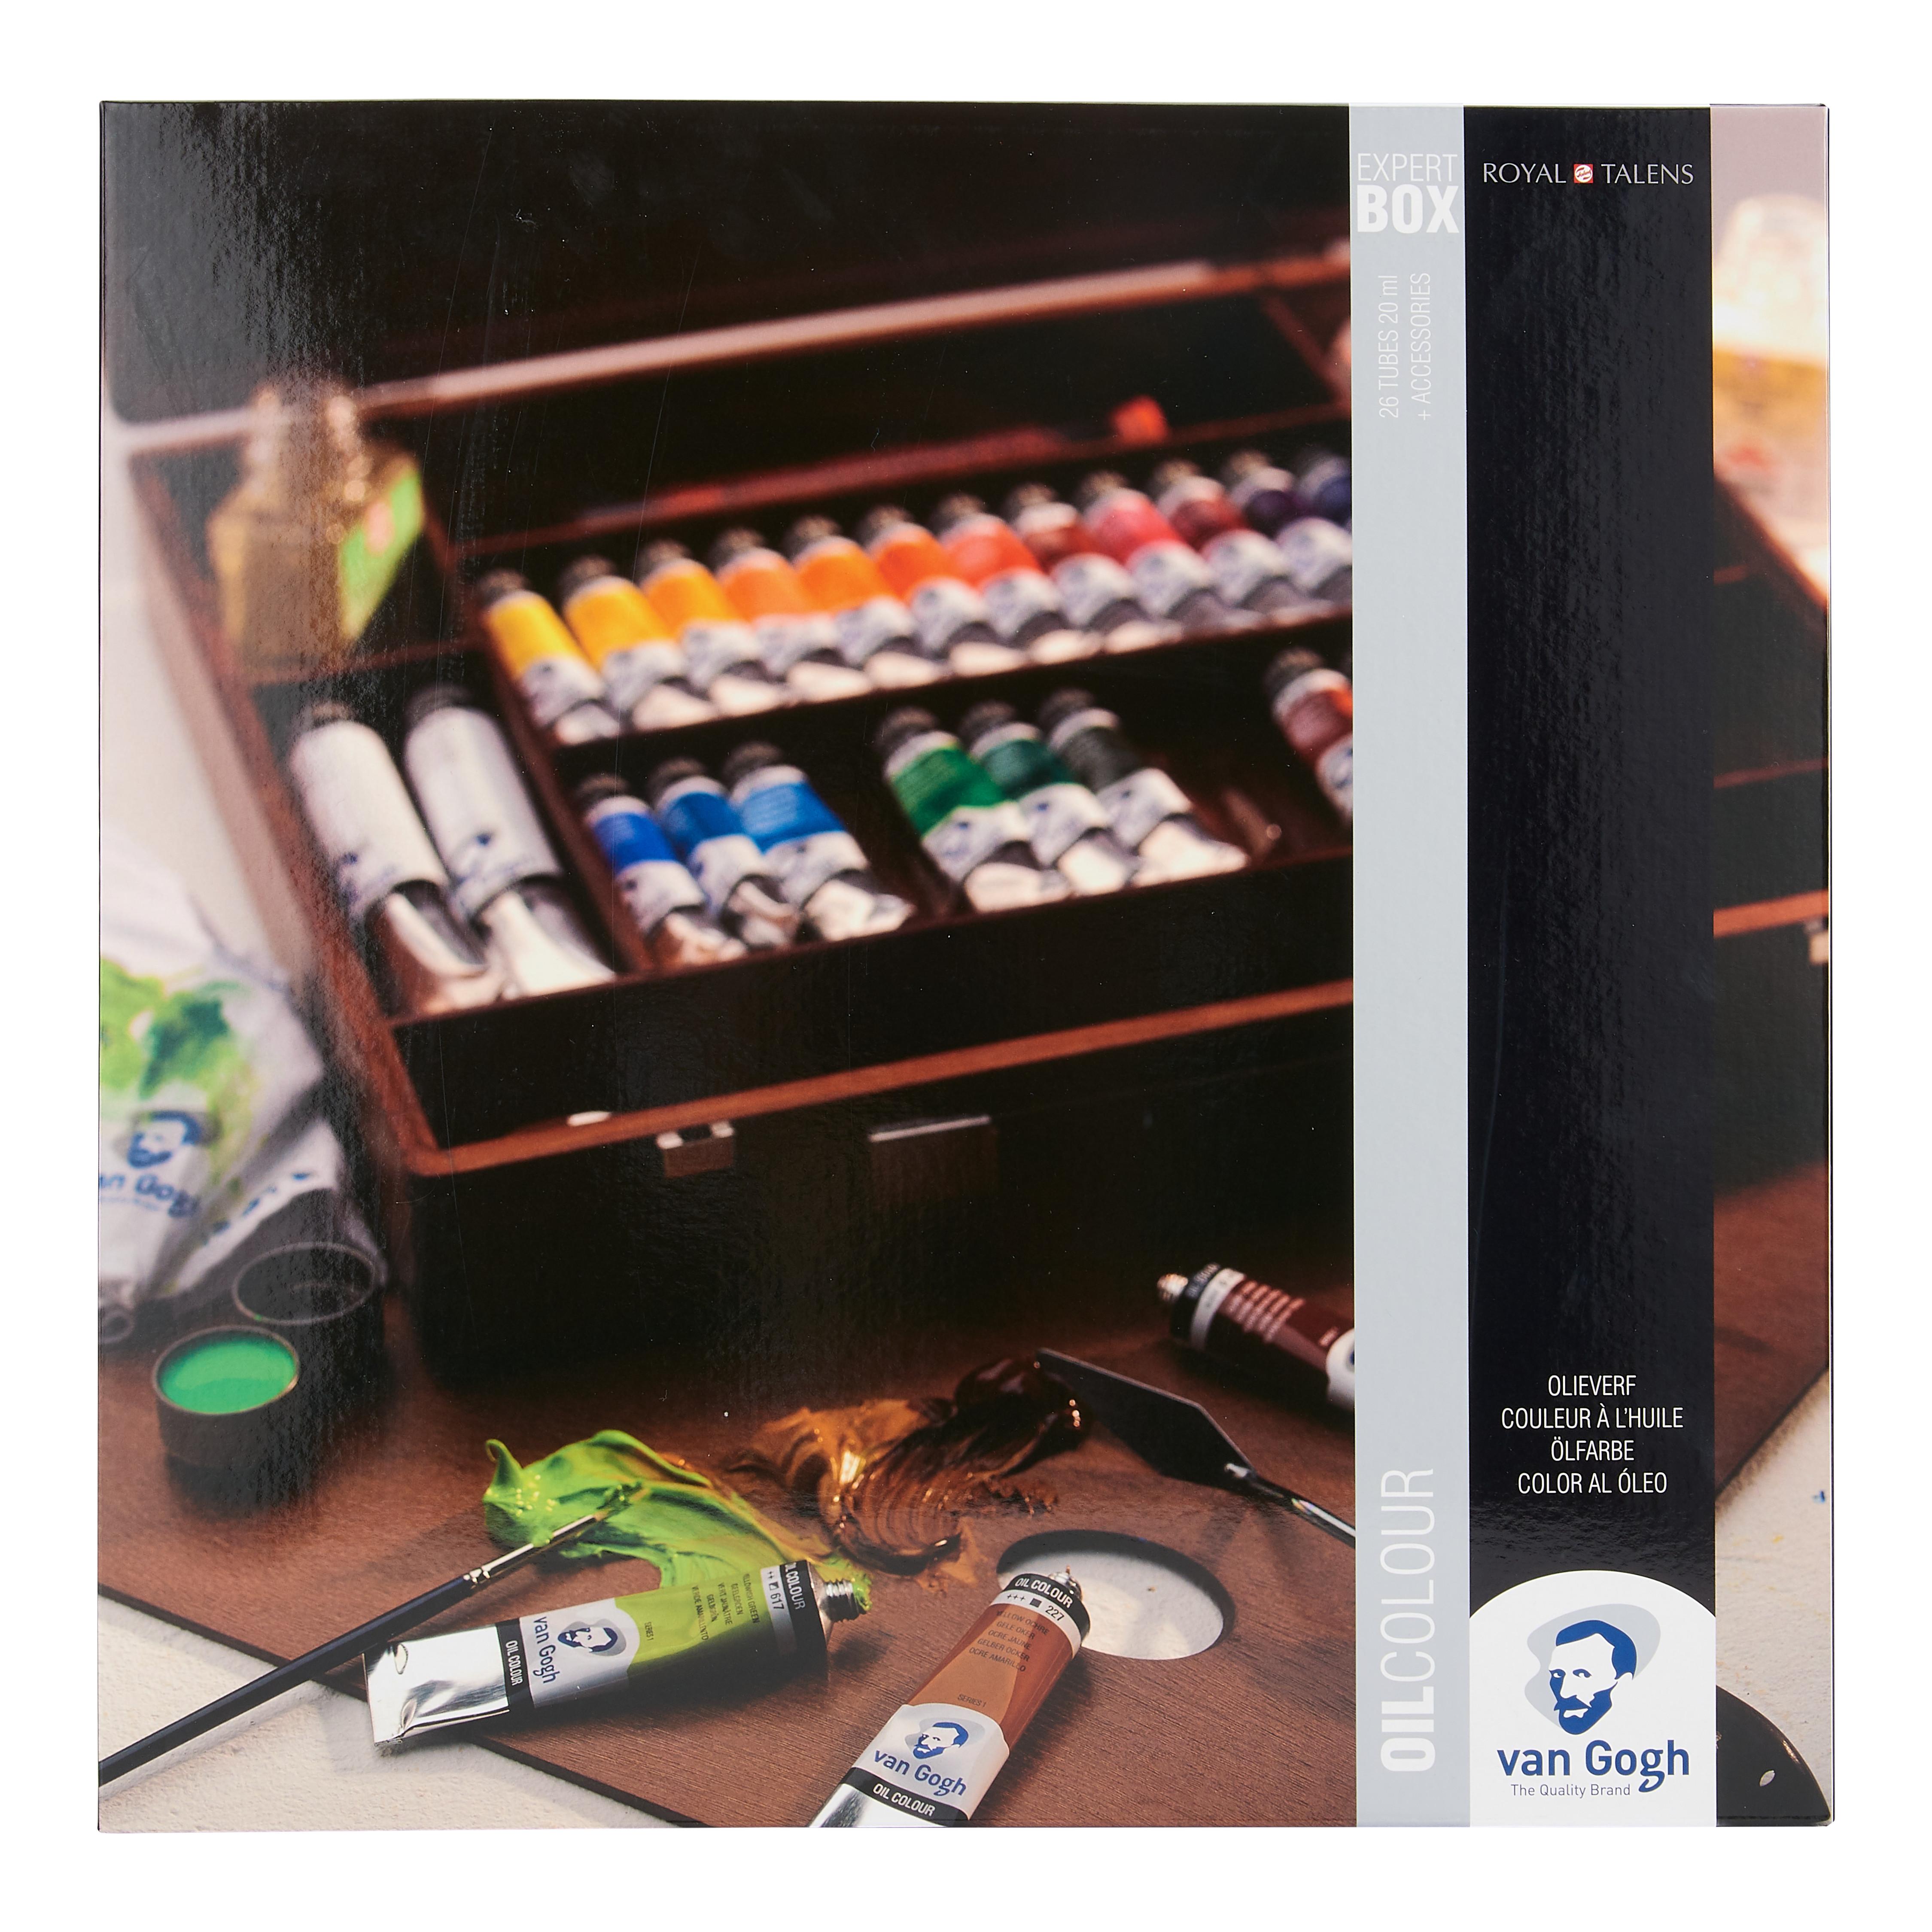 Van Gogh Oil Colour Wooden Box Set Expert with 24 Colours in 20ml Tube and 2 Colours in 60ml Tube + Accessories